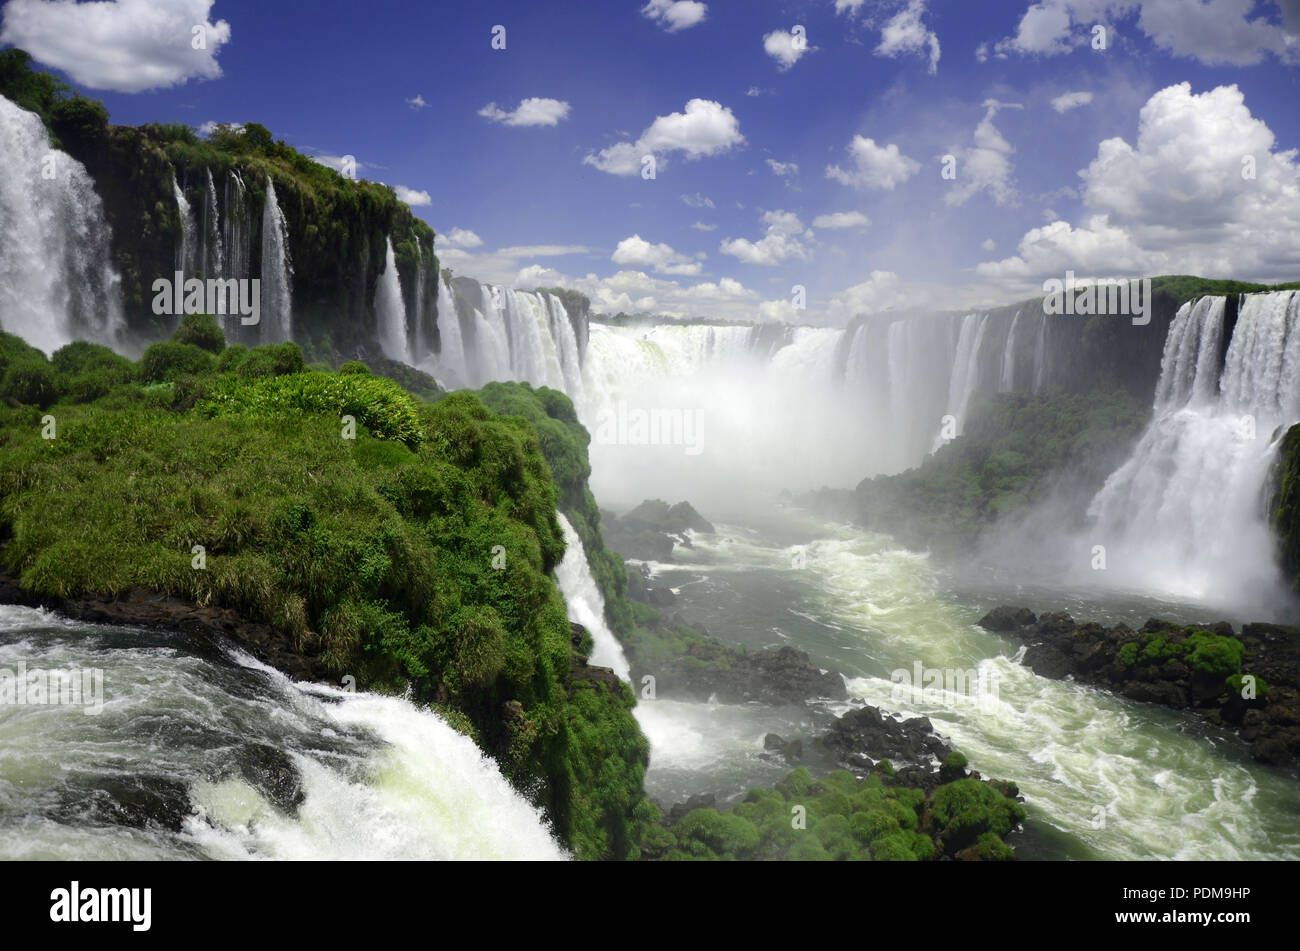 Iguacu Iguazu National Park Brazil side-staring into the Devil's Throat - Stock Image